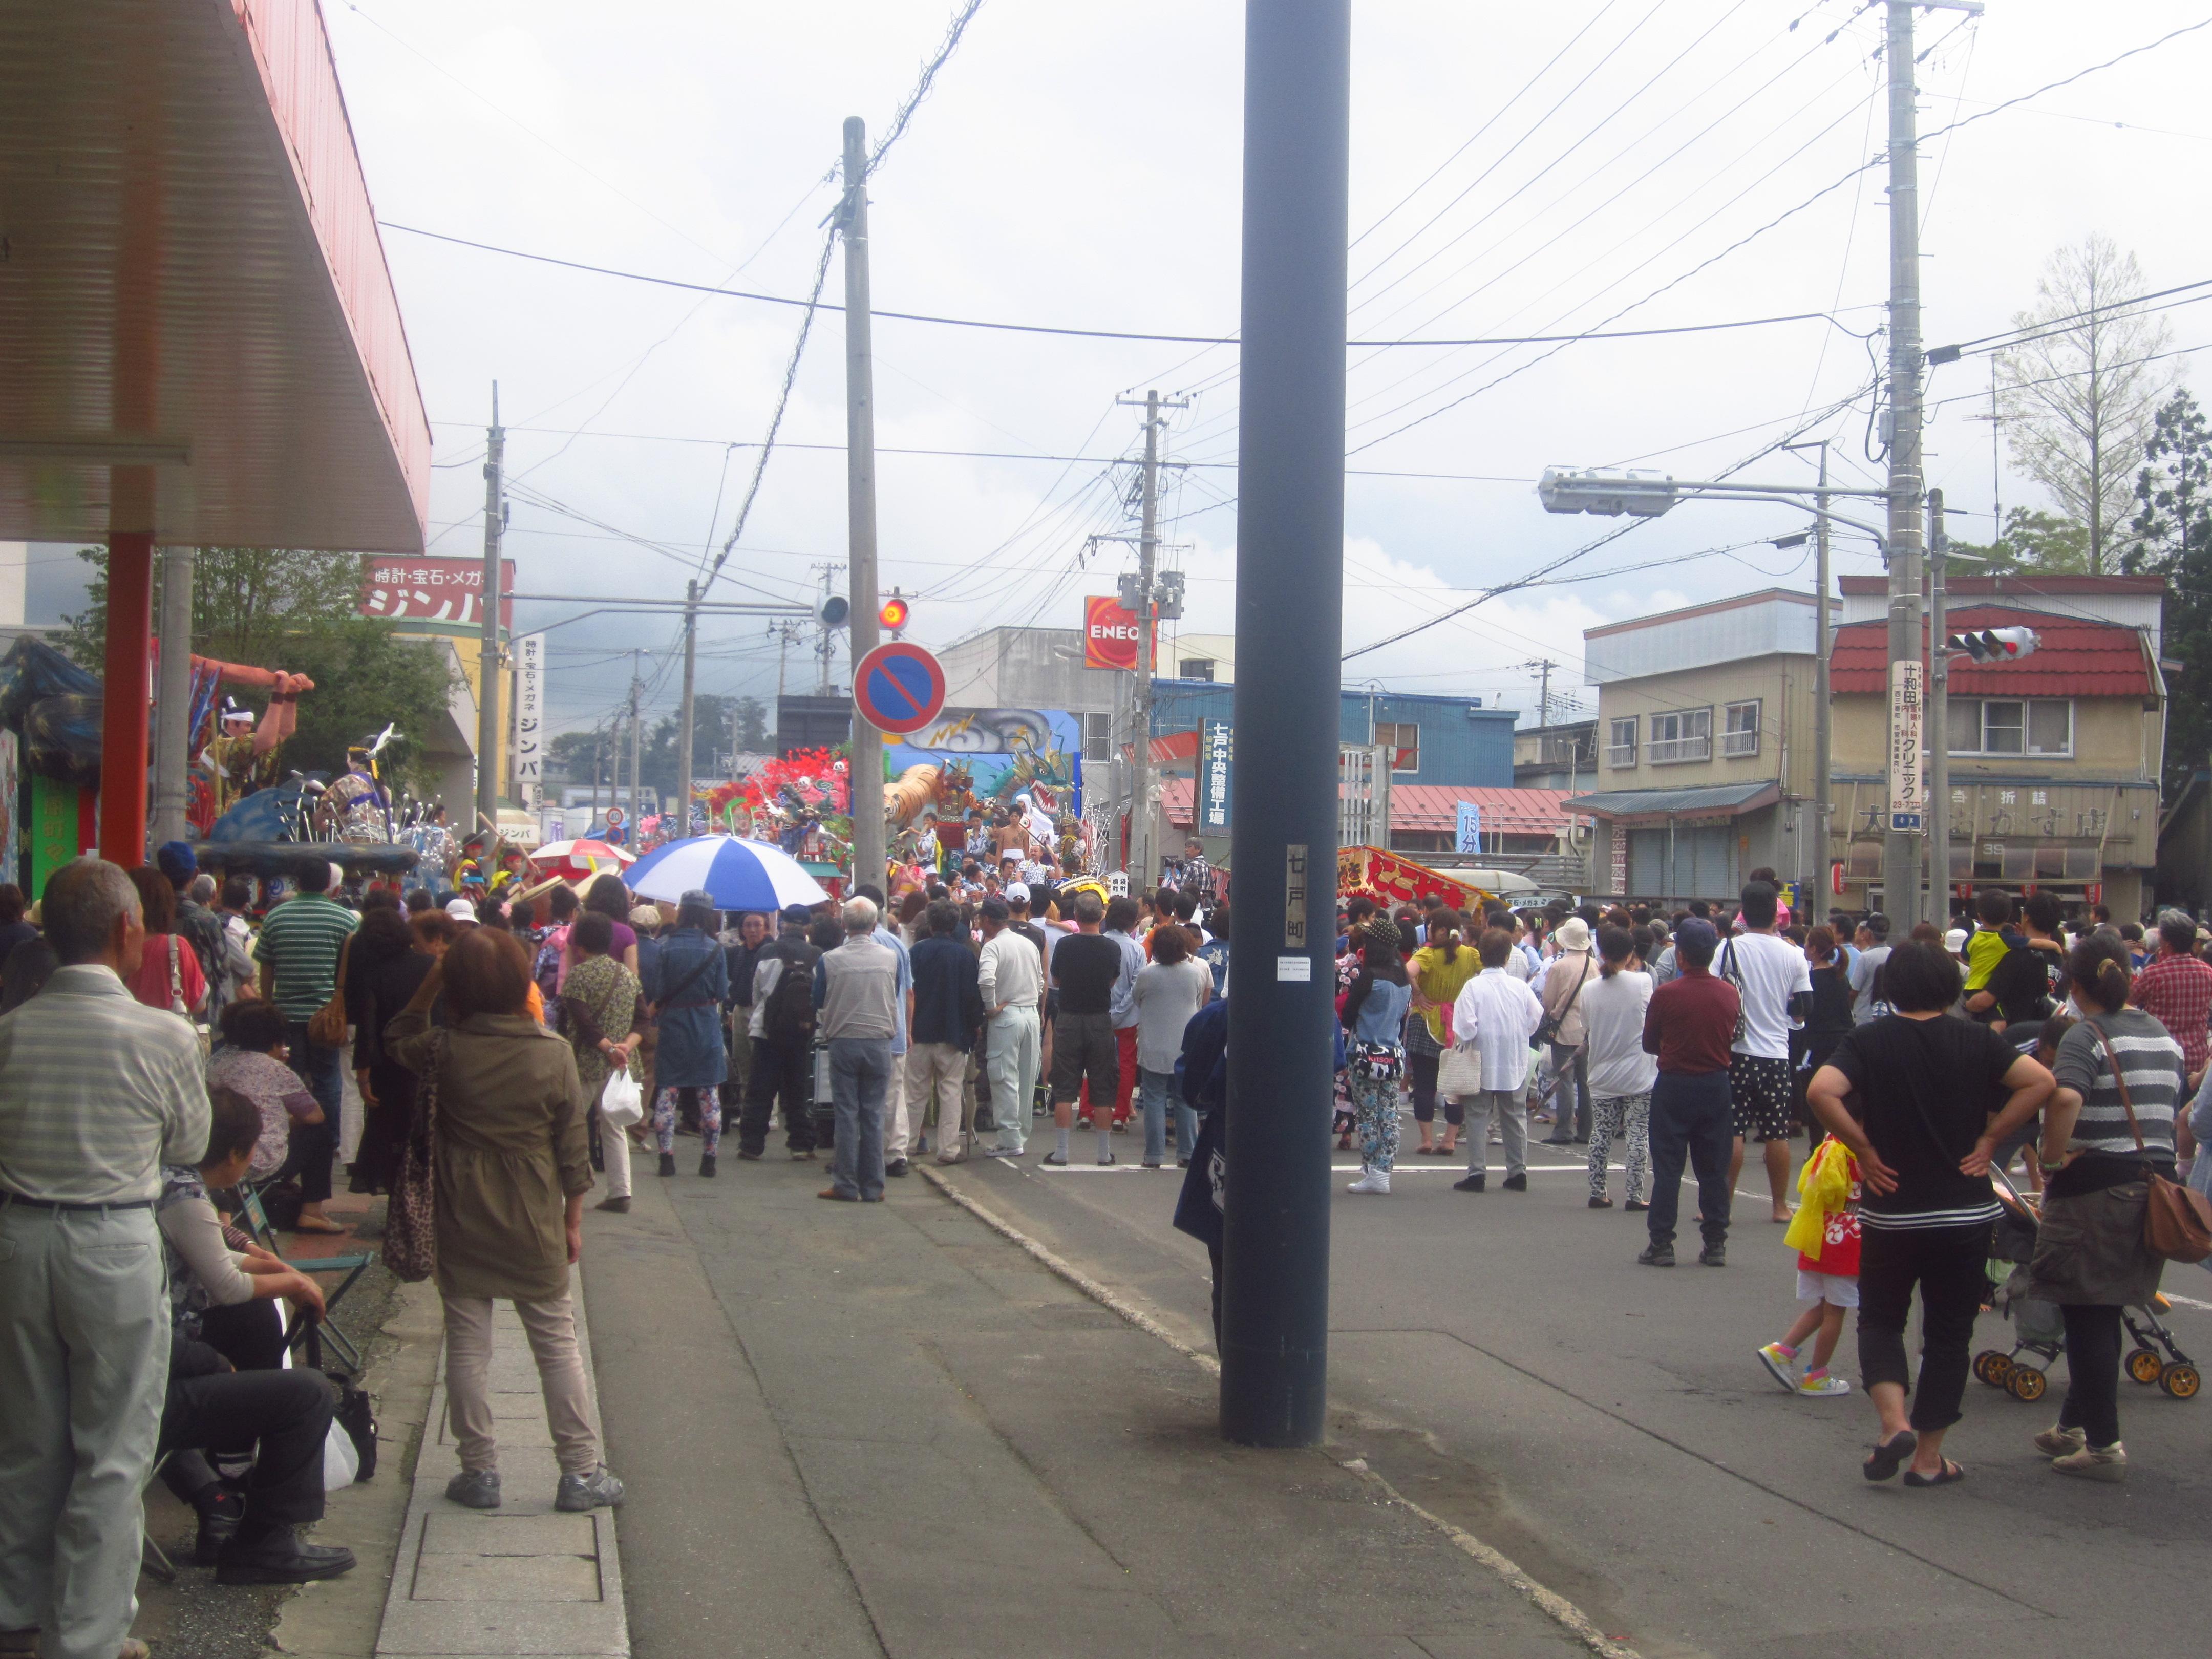 IMG 4274 - 麻布十番納涼祭り25,26日(七戸町出店)